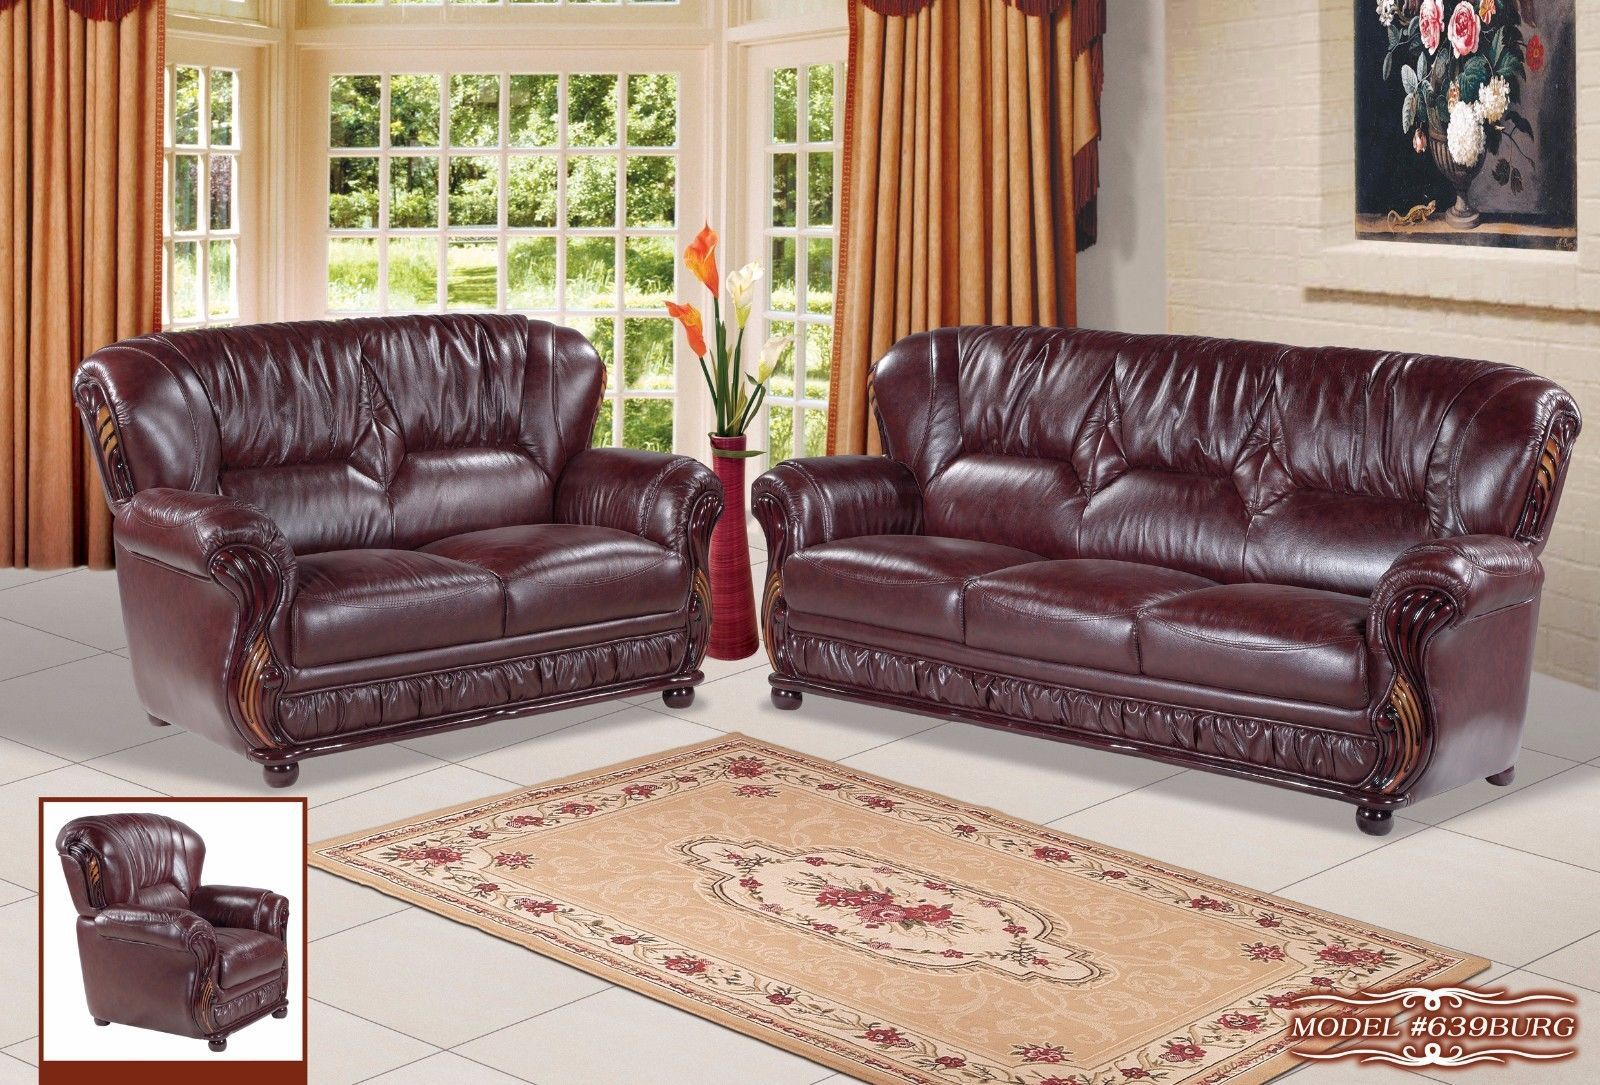 Meridian 639 Mina Living Room Set 2pcs in Burgundy Bonded Leather Traditional